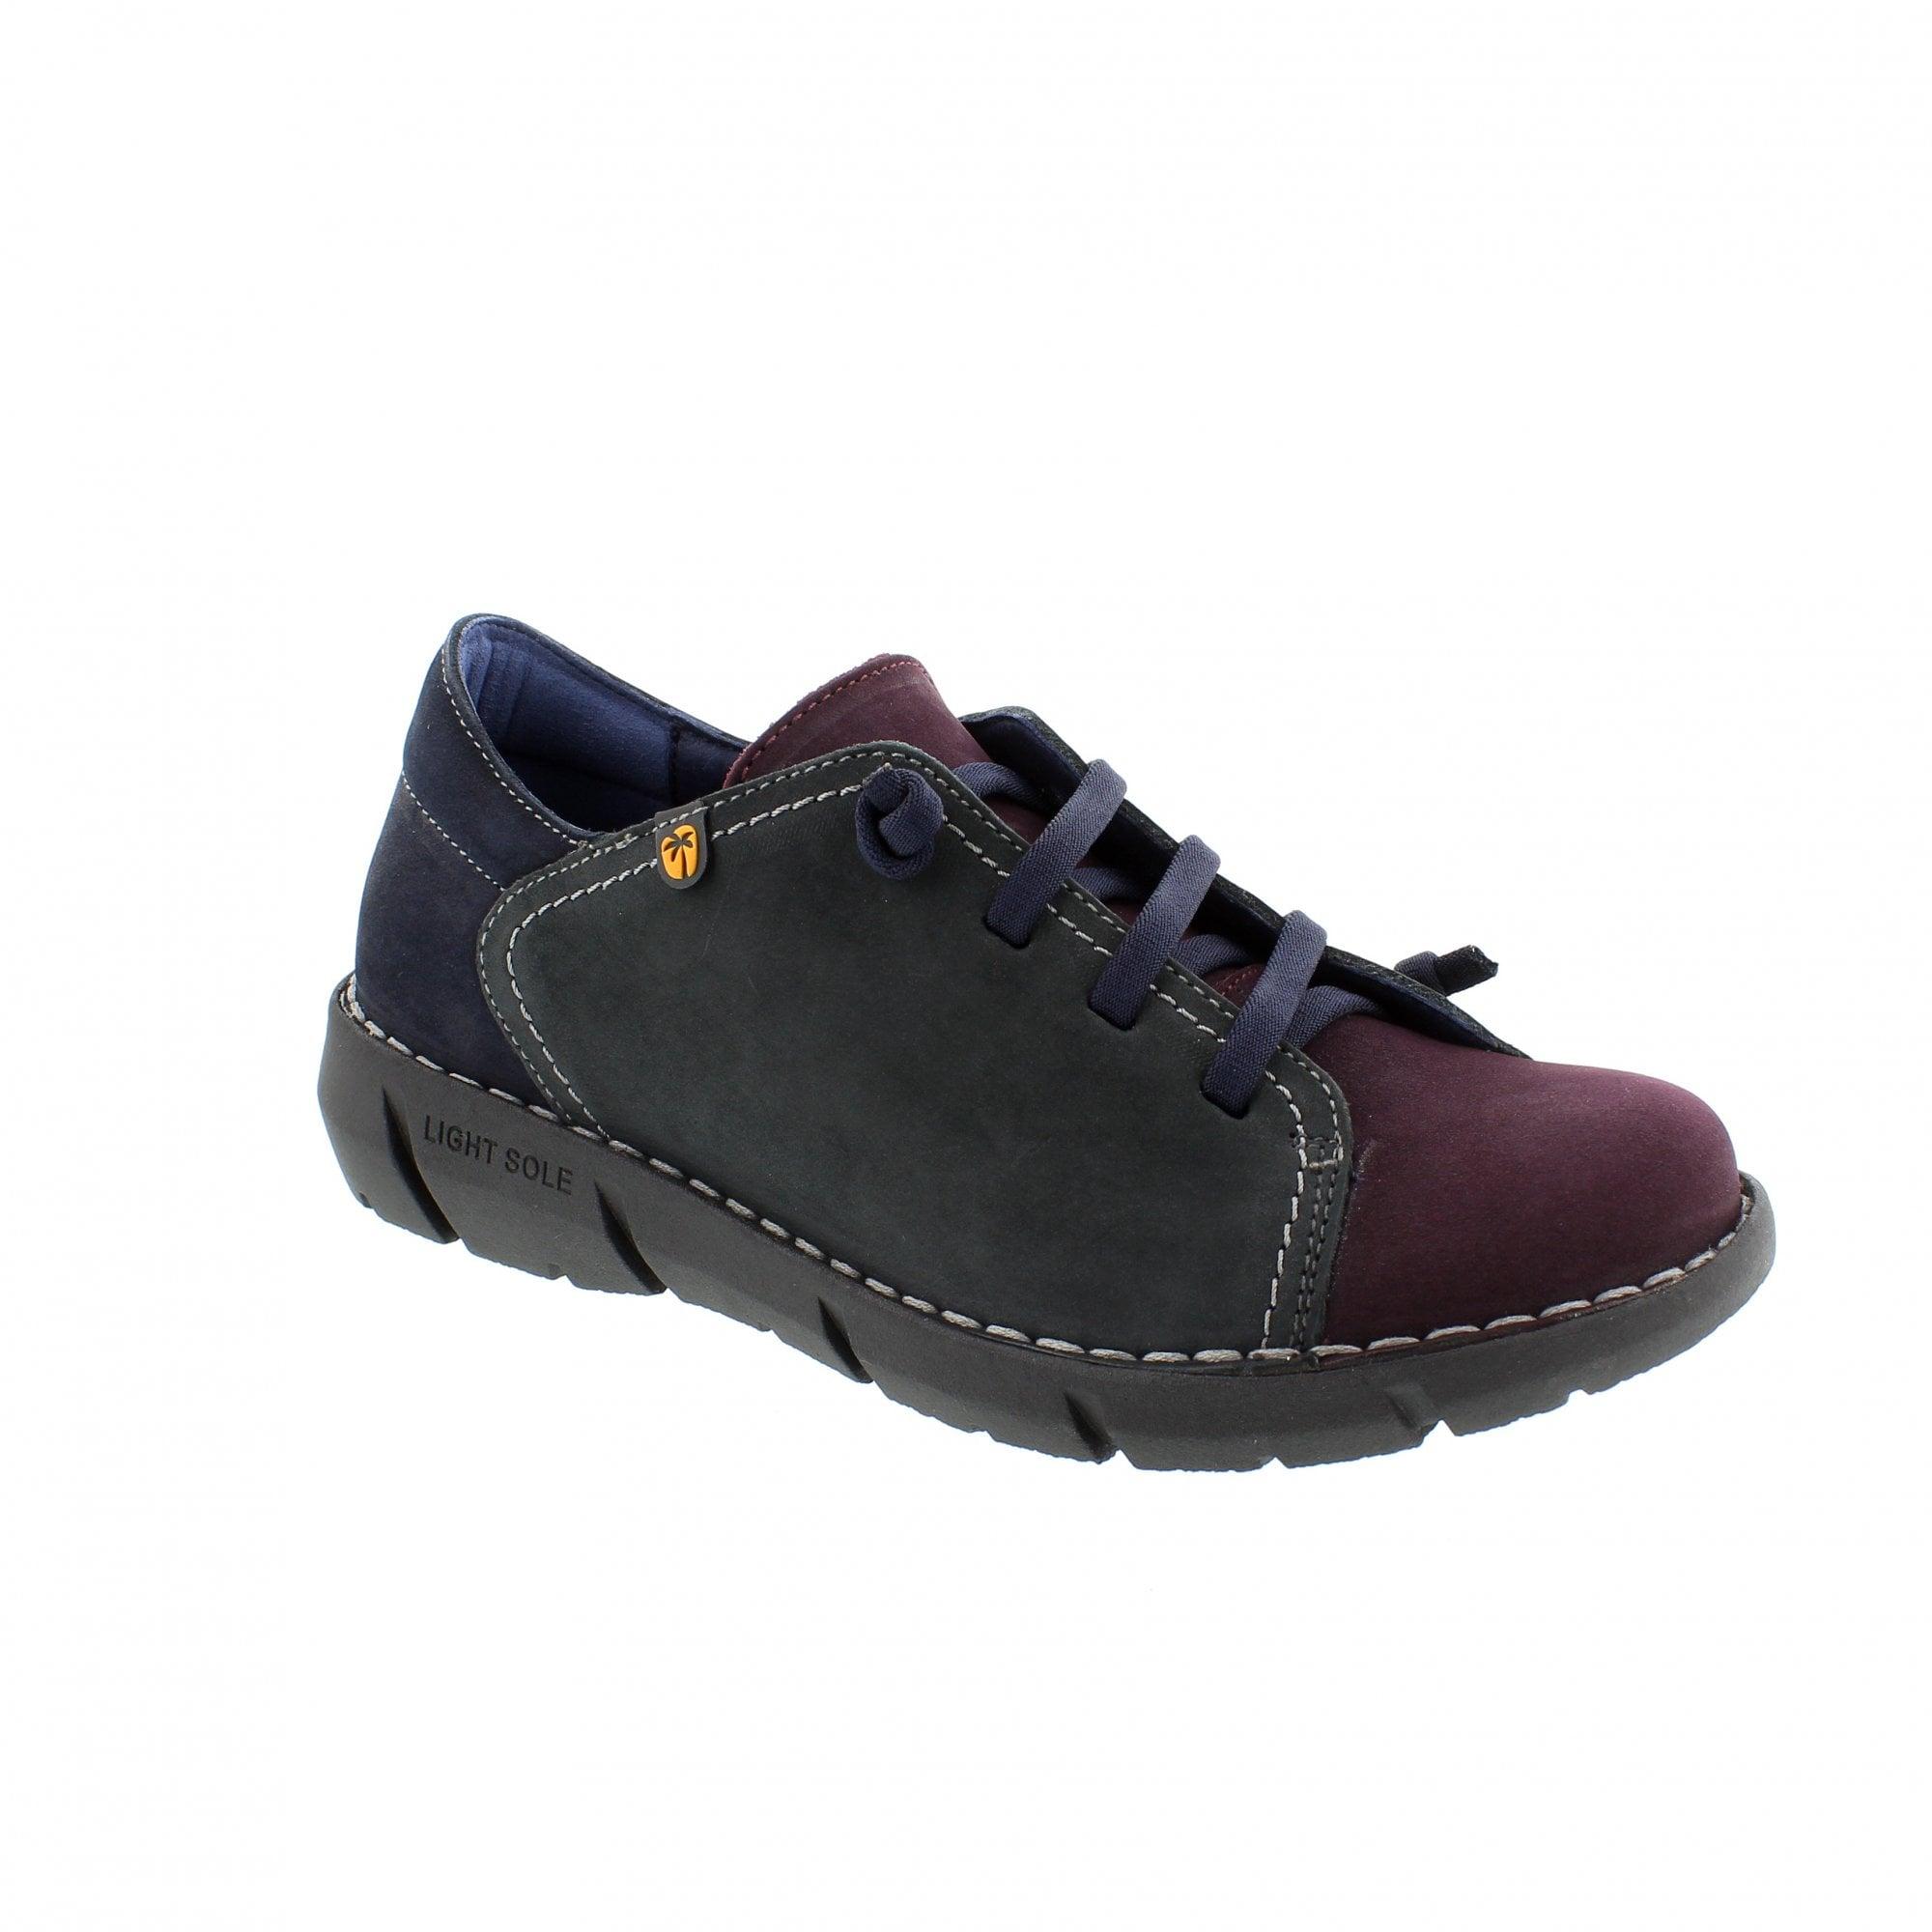 706ecbccd08ca Jungla 6975-v70 Purple/Grey Womens Lace Up Shoes   Rogerson Shoes